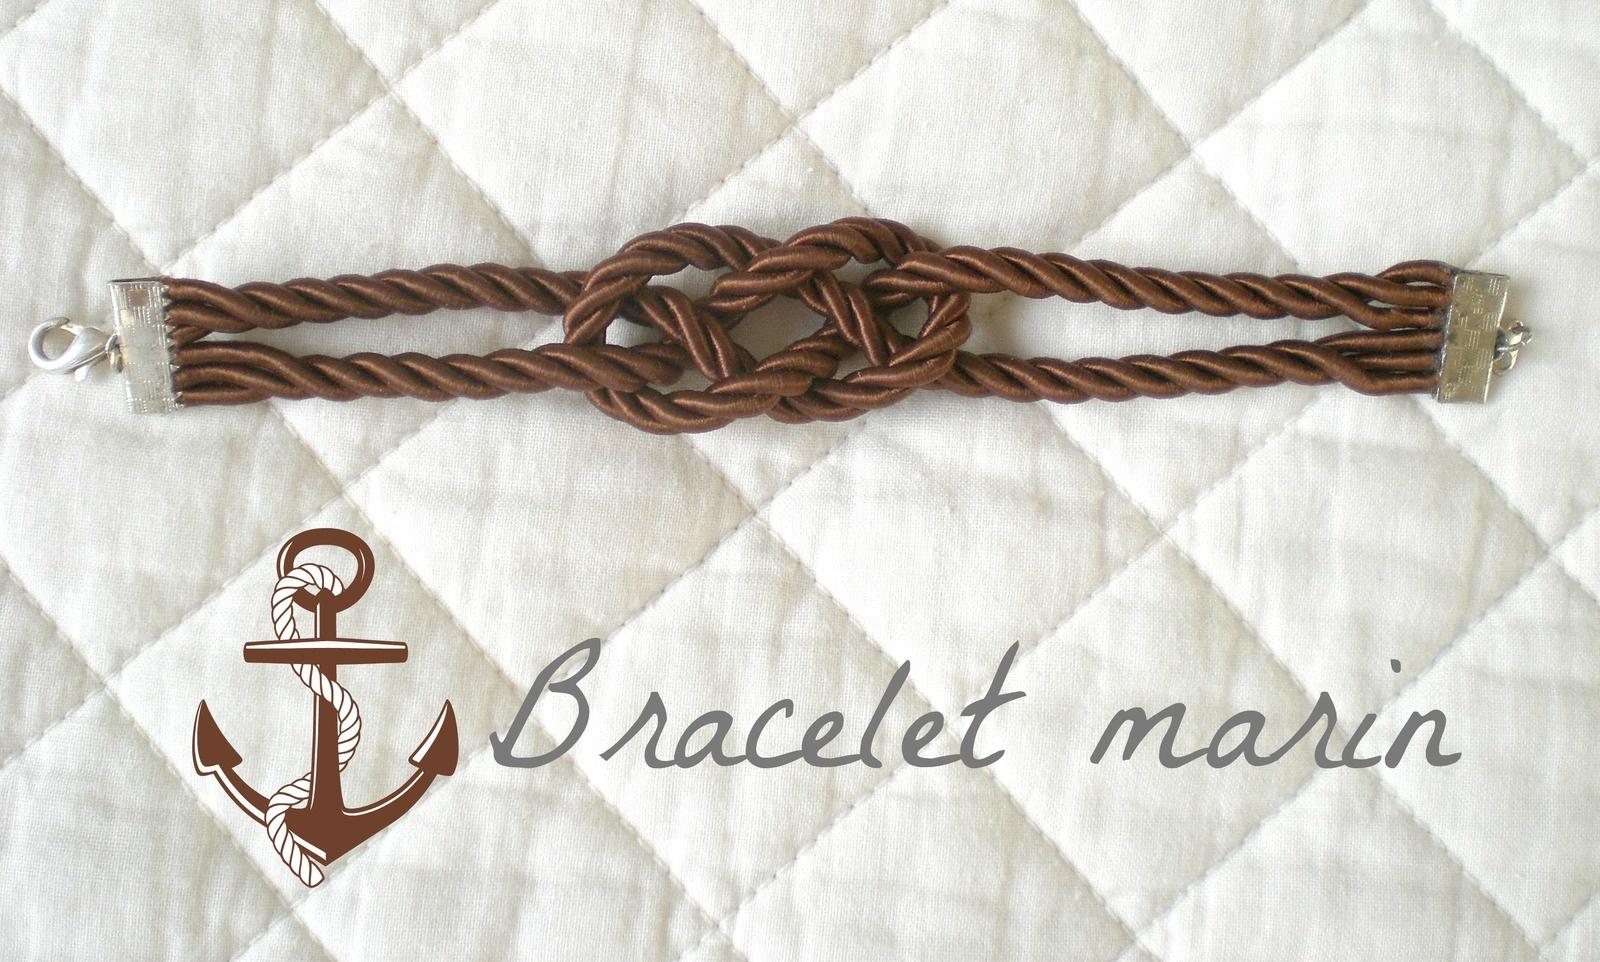 Bracelet au nœud marin